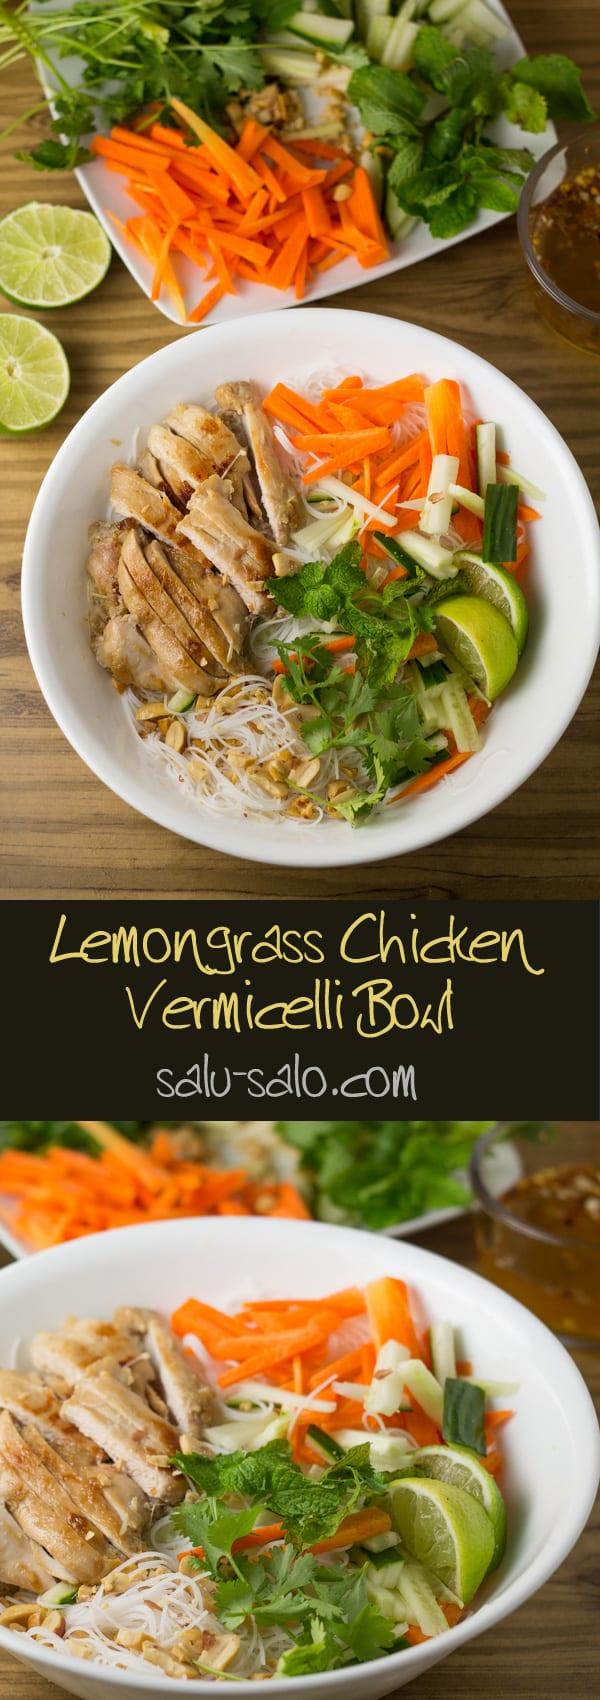 Lemongrass Chicken Vermicelli Bowl